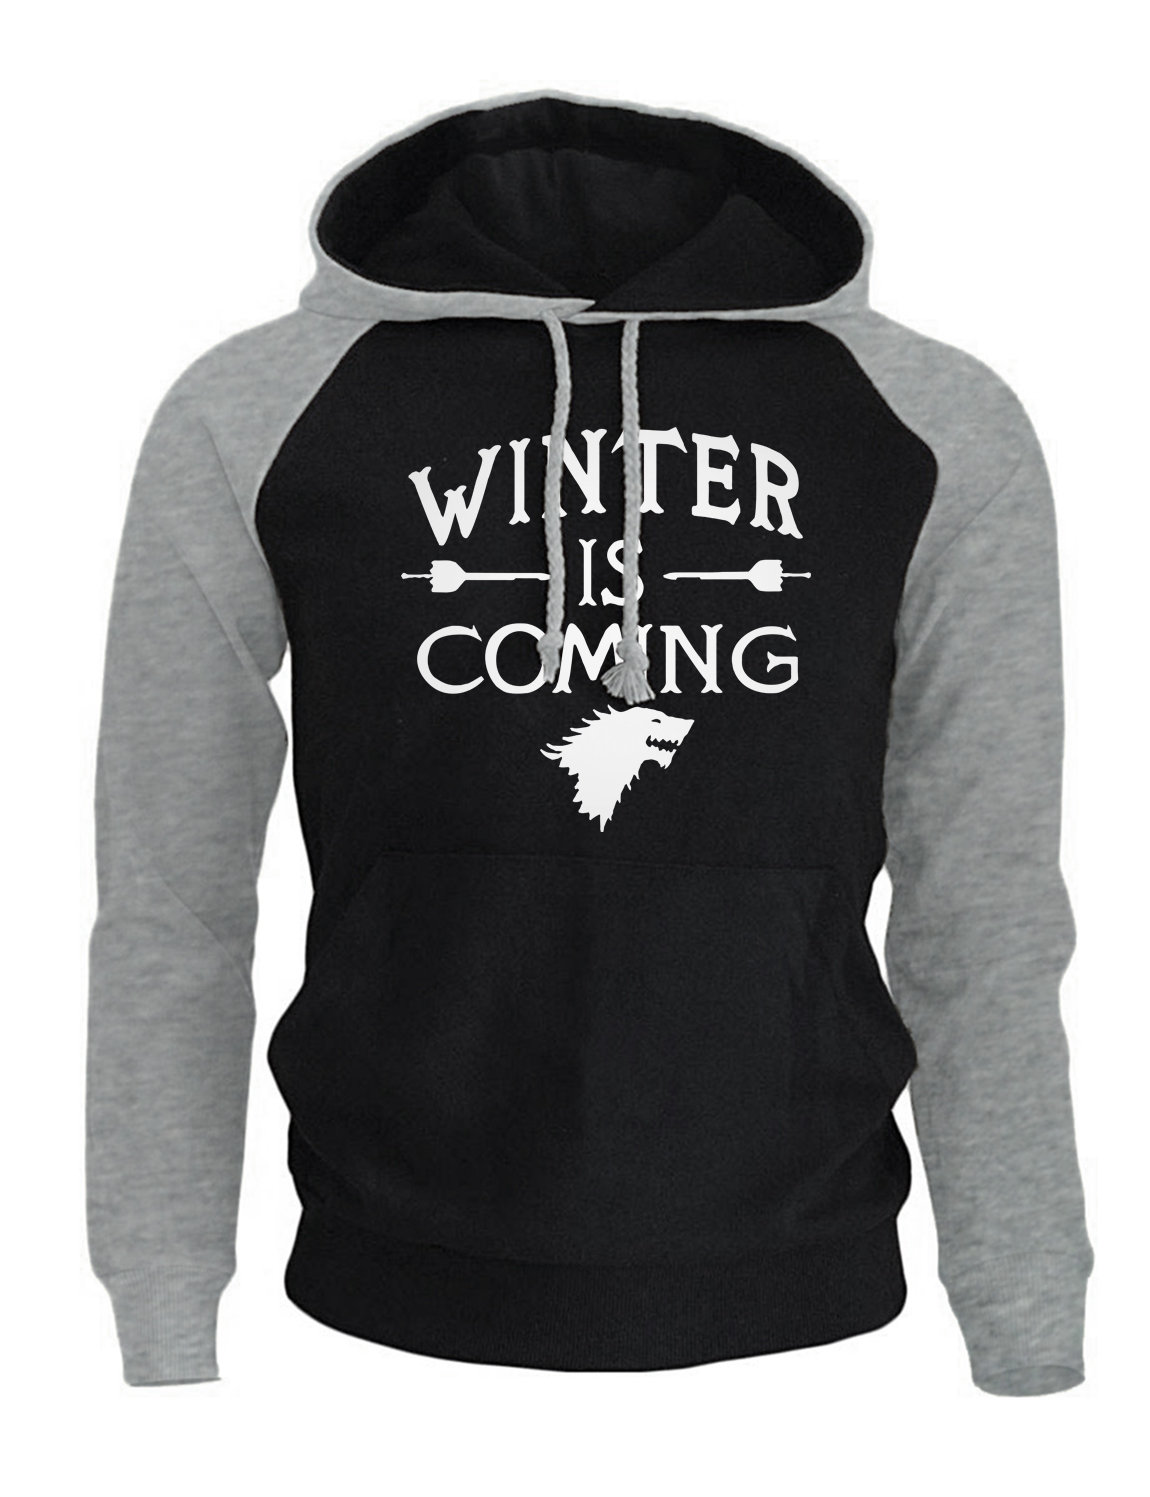 Game of Thrones Fashion Streetwear Hoodies 2017 Autumn New Arrival Winter Fleece Raglan Sweatshirts Winter Is Coming Hoody Men